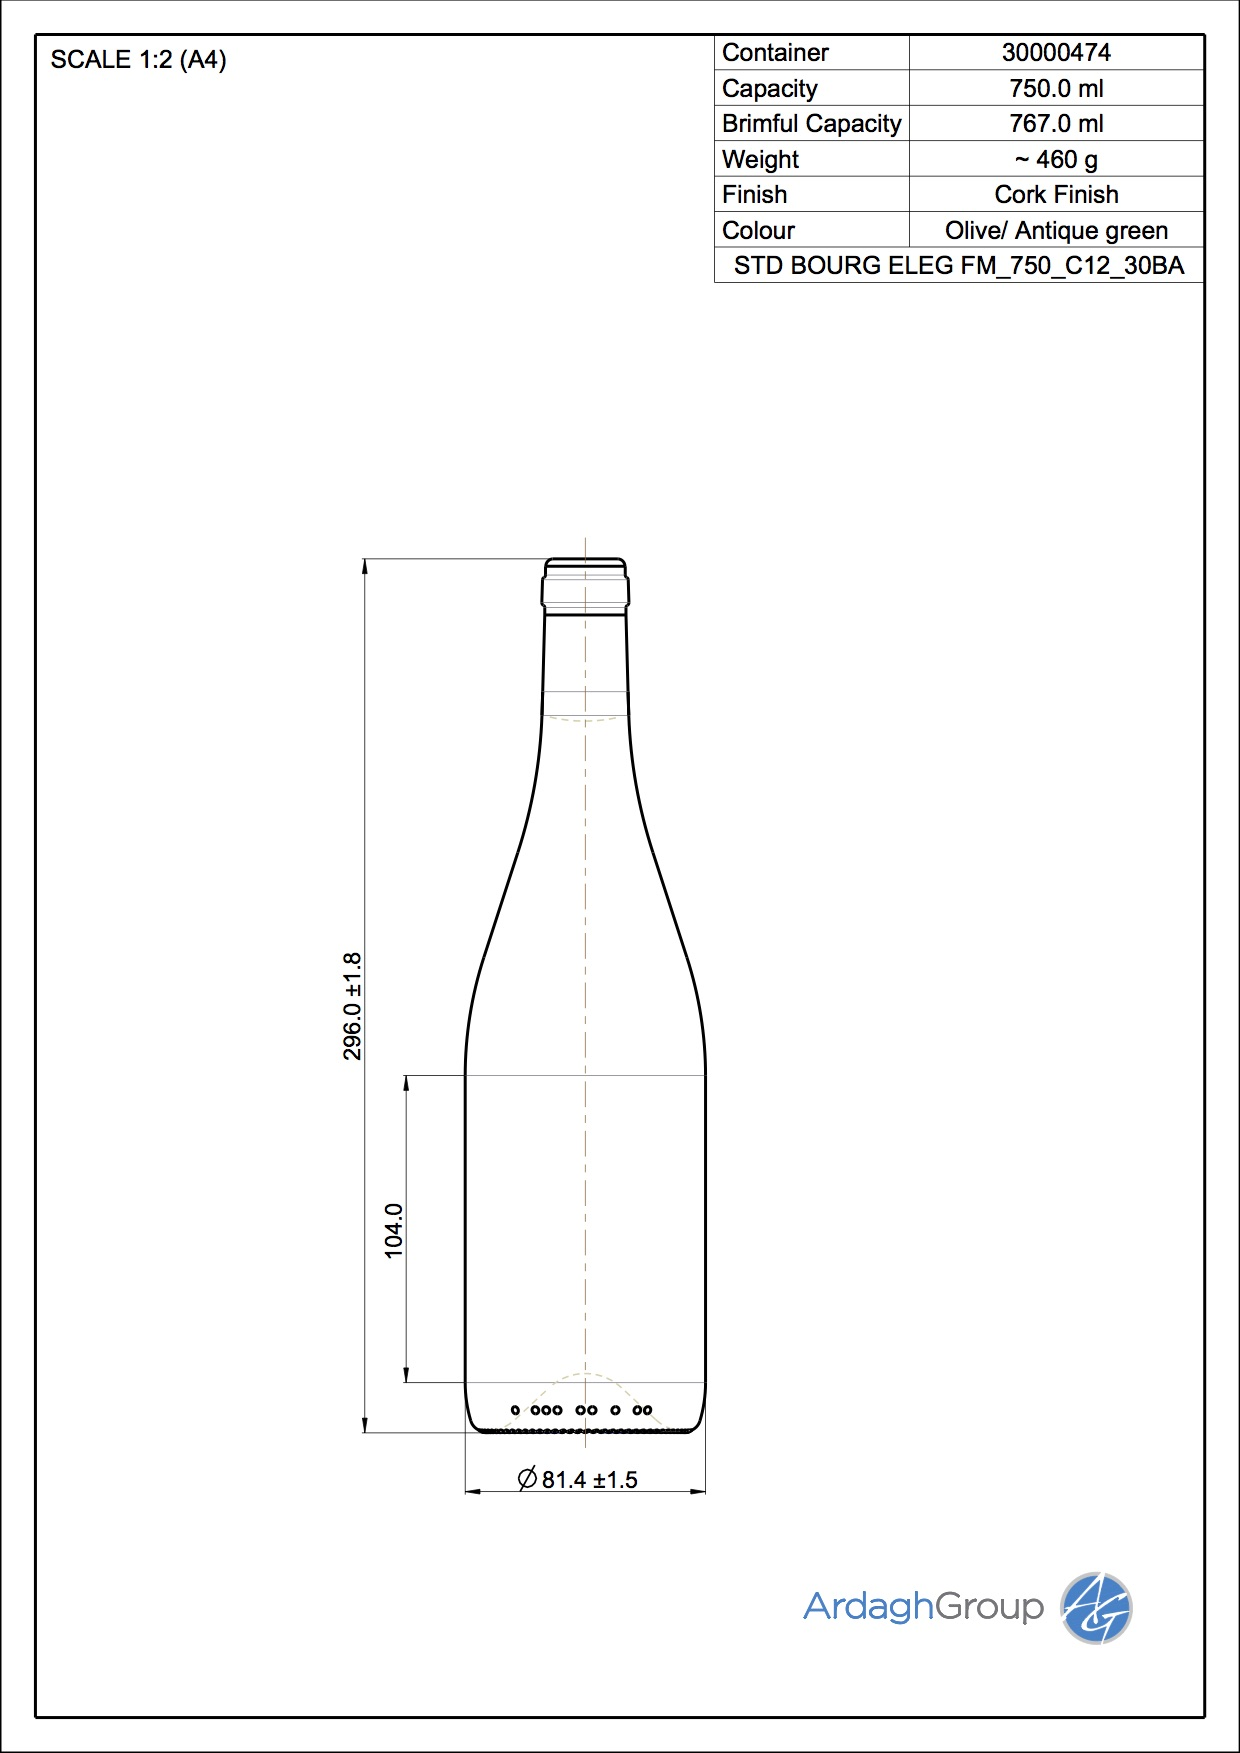 BOURG ELEG AN 750 C12 30BA